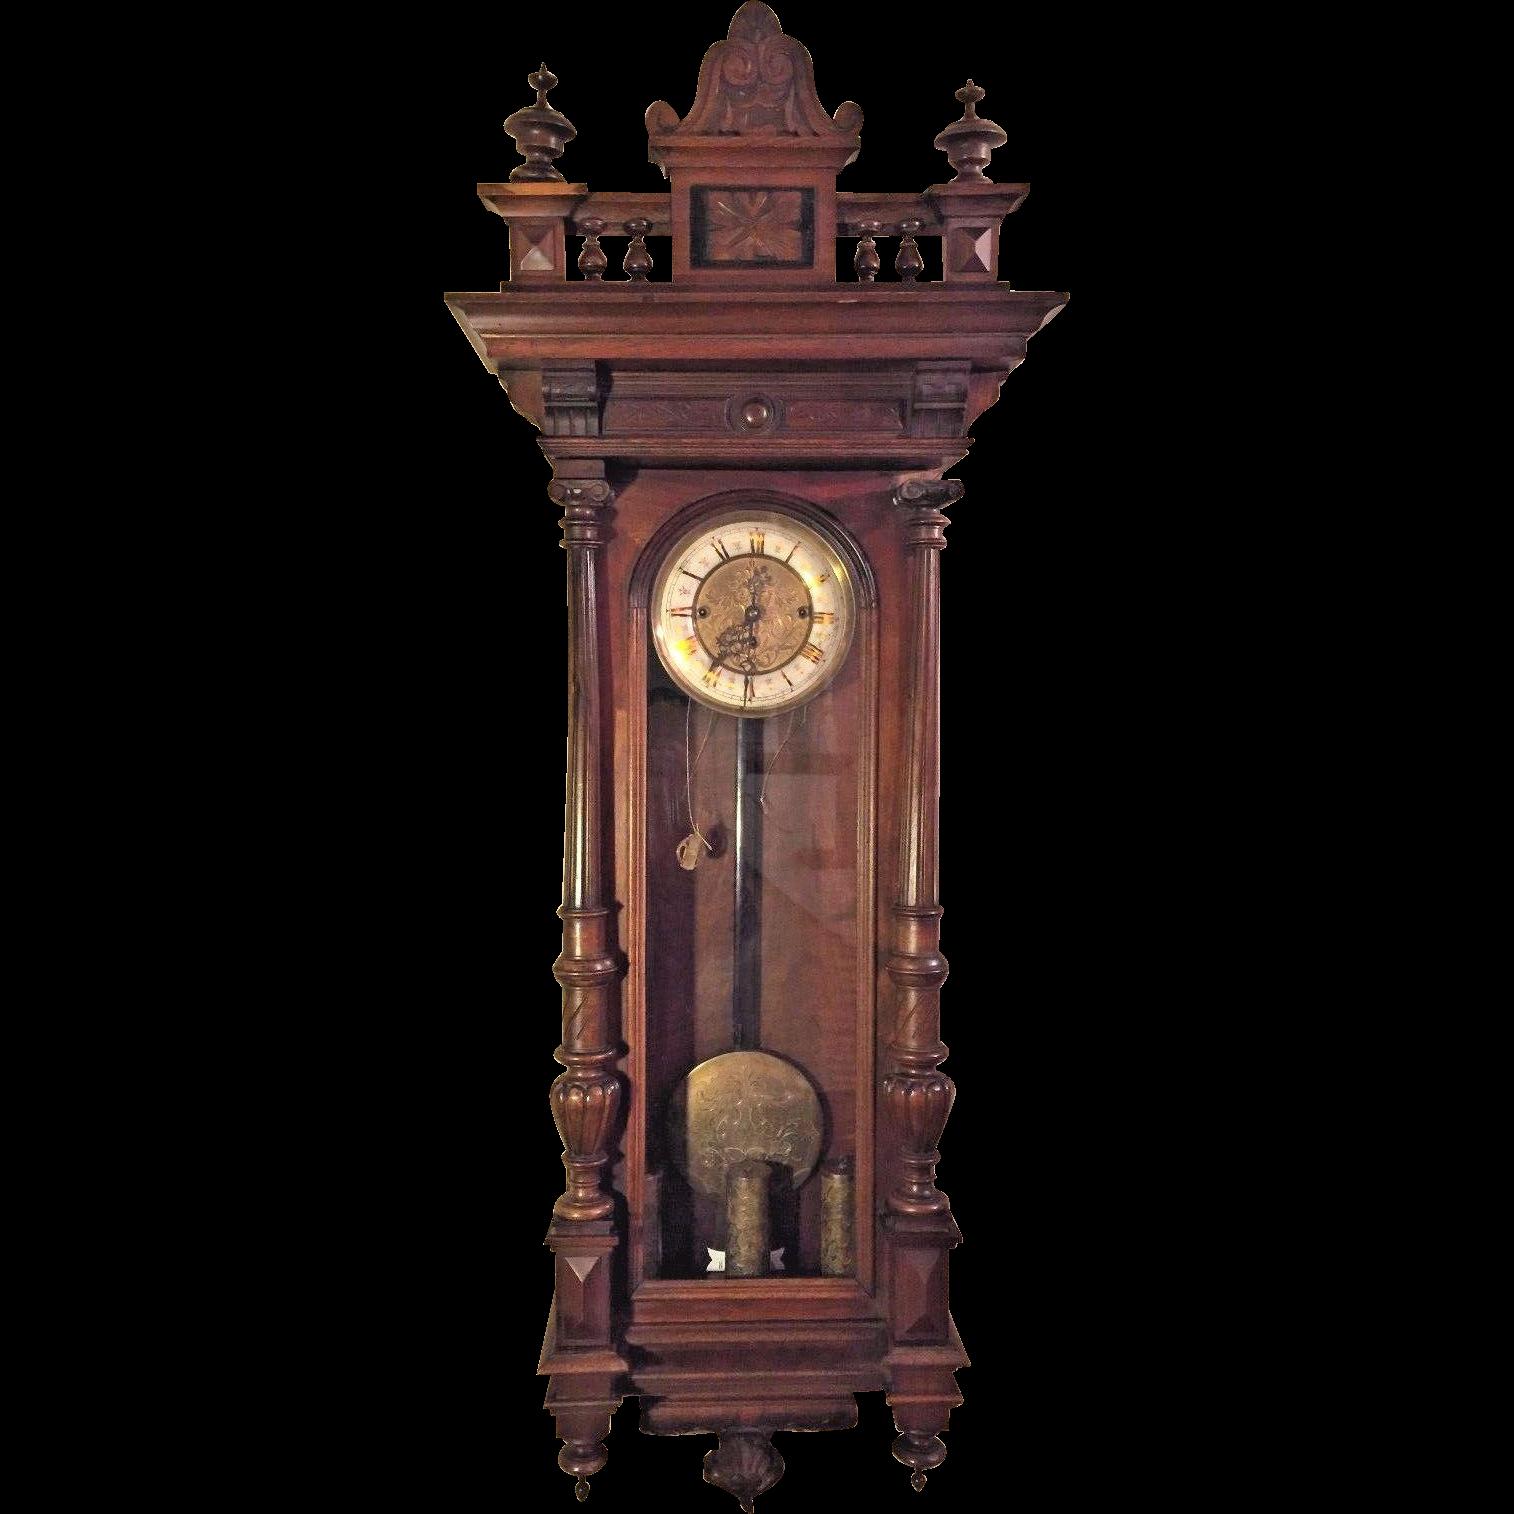 100 Wall Clock On Wall Clock | Large Wall Clocks Over 25 ...